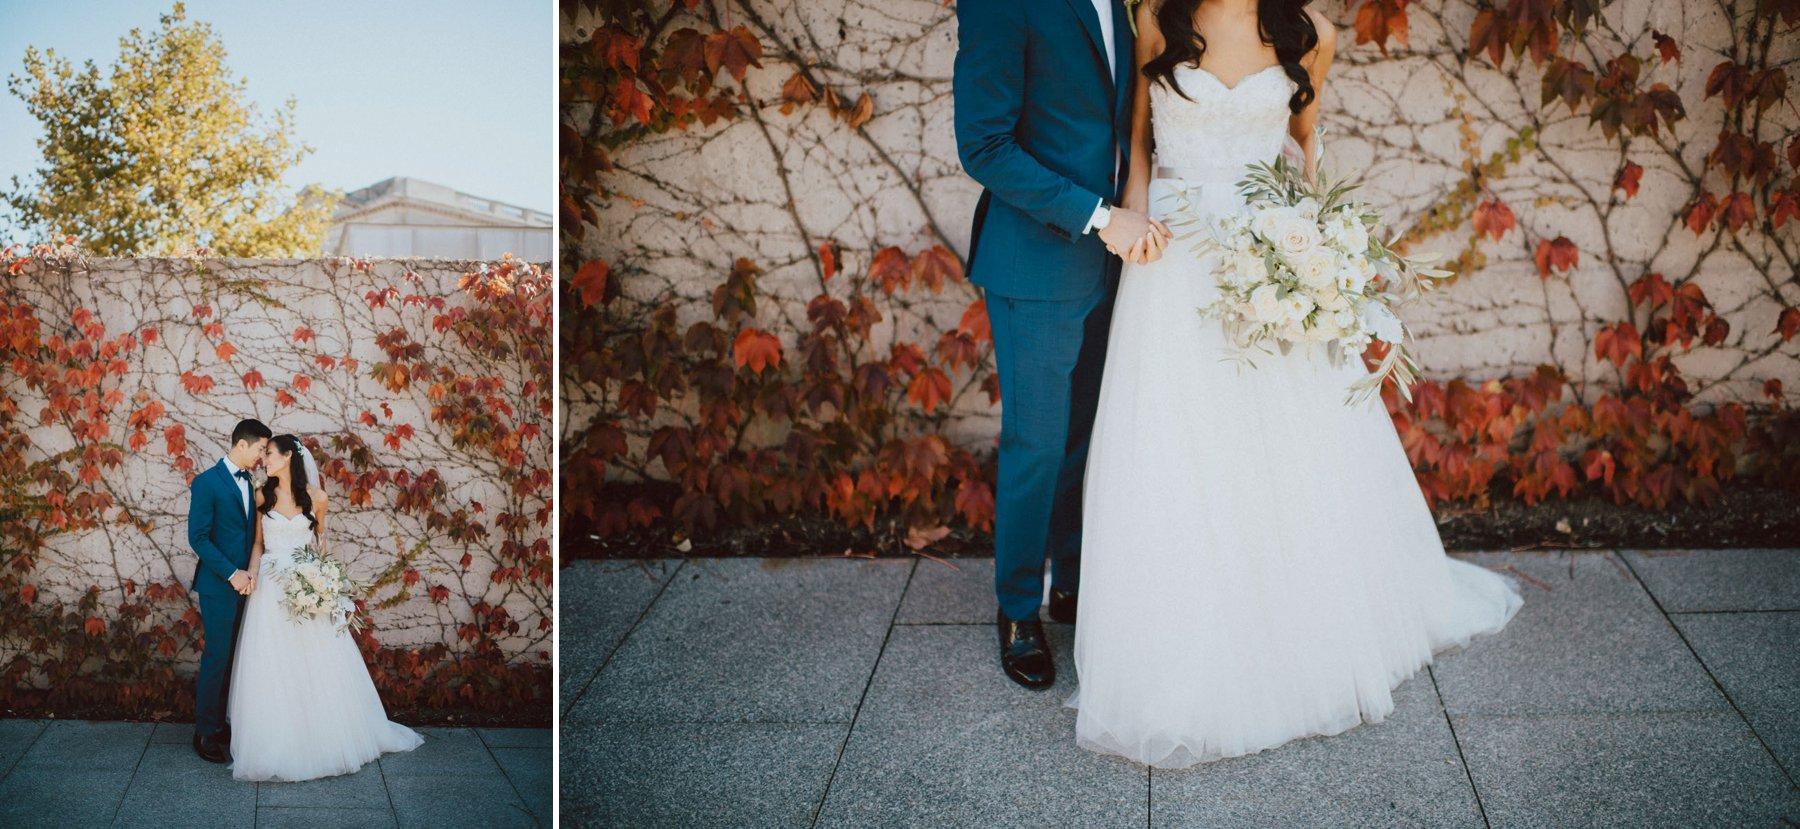 philadelphia-wedding-photographer-73.jpg